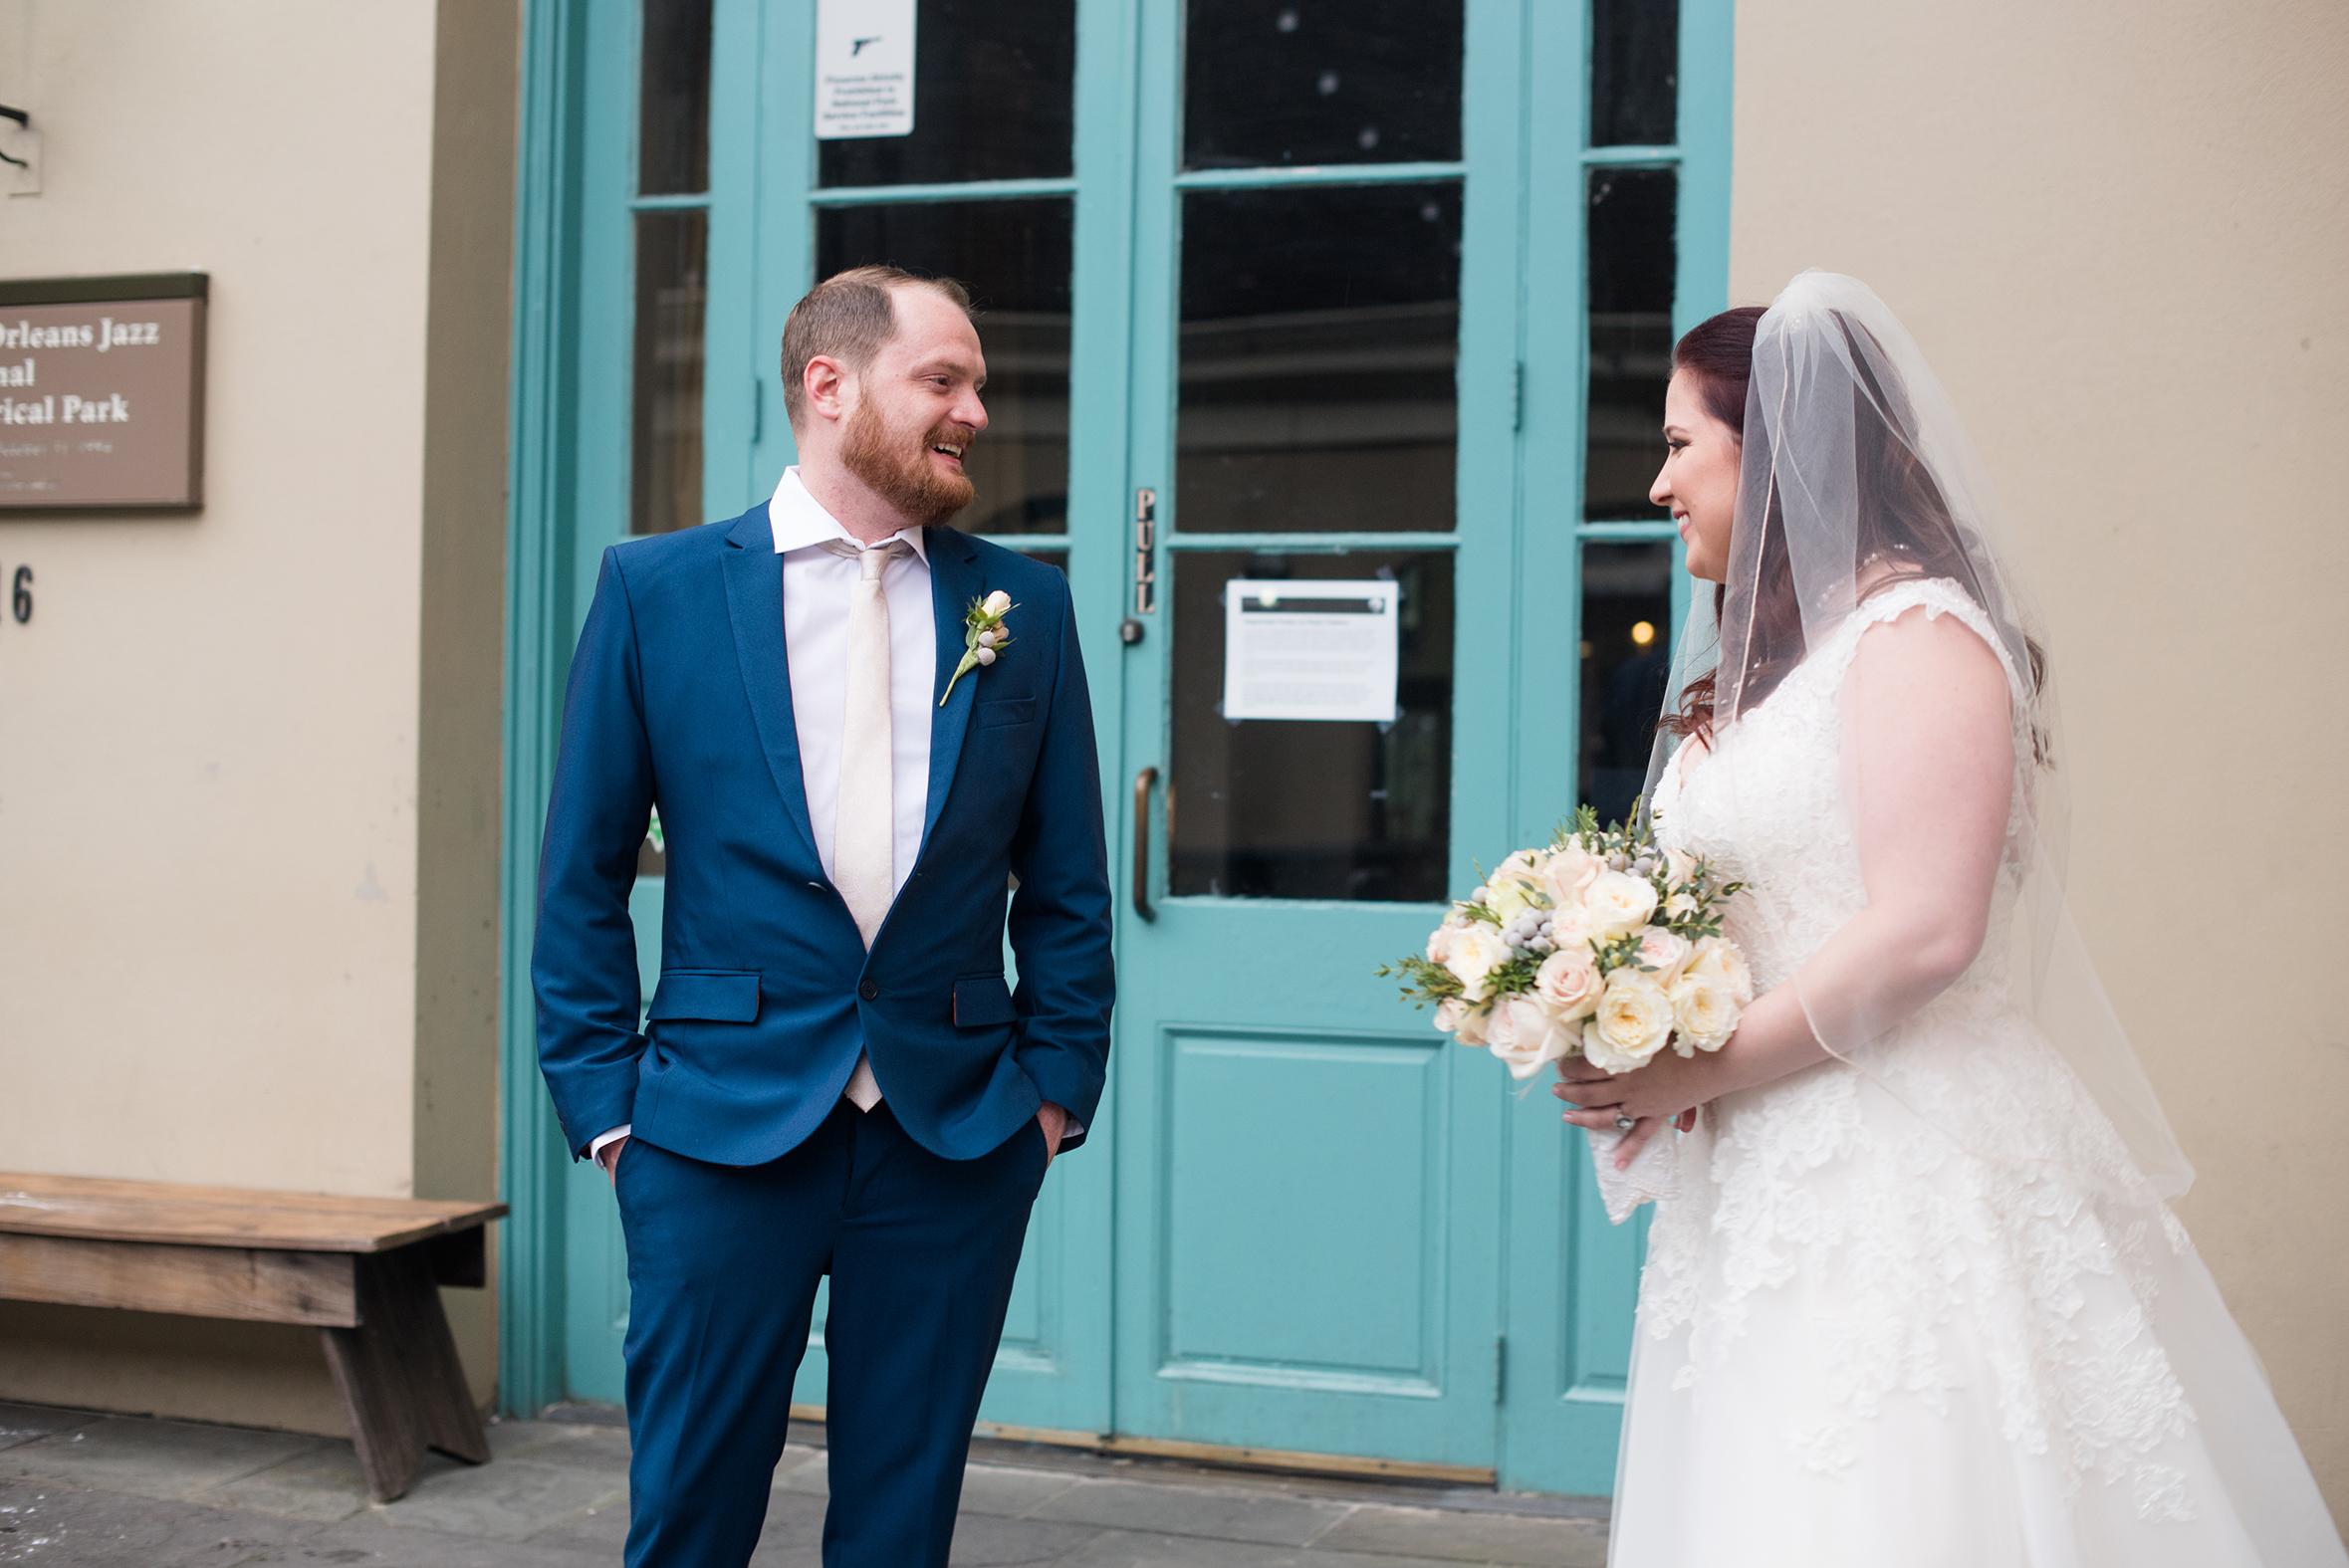 new orleans wedding photographer 9.jpg